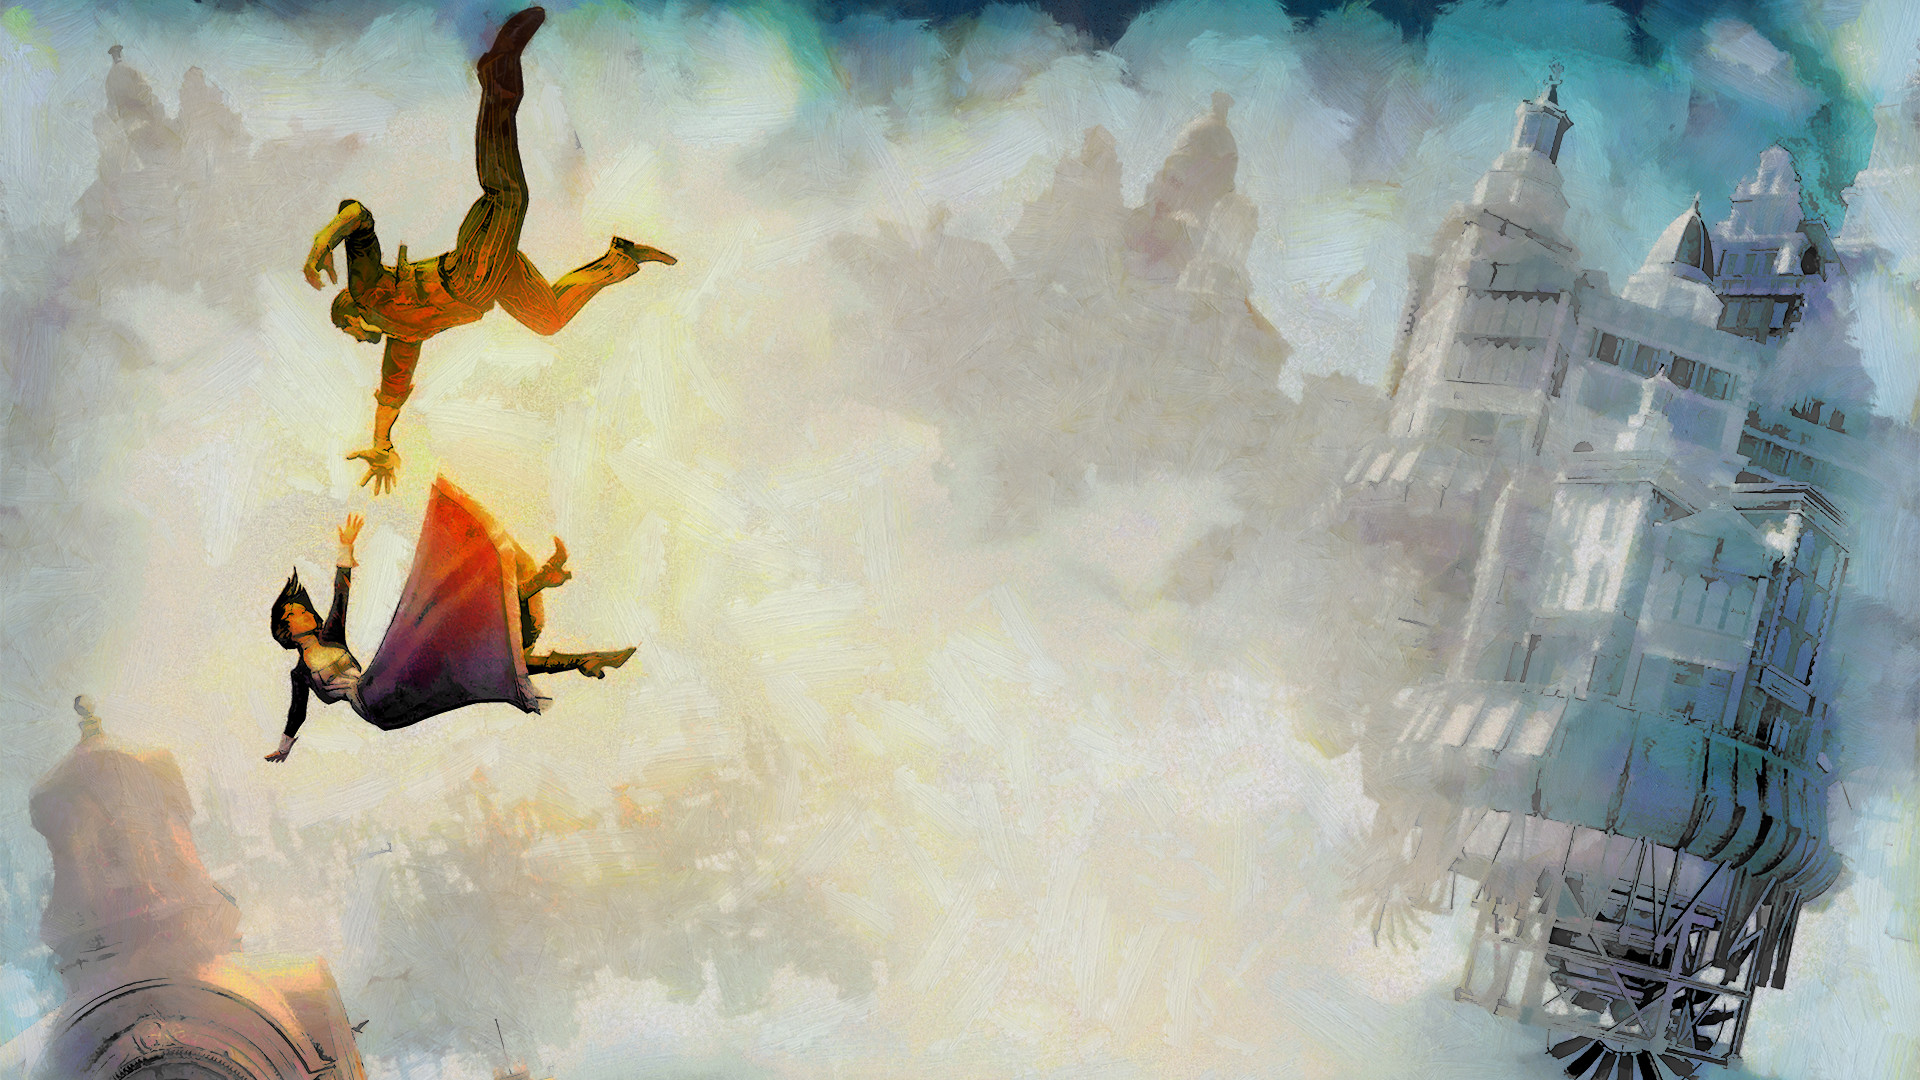 Bioshock Infinite HD Wallpapers Backgrounds Wallpaper